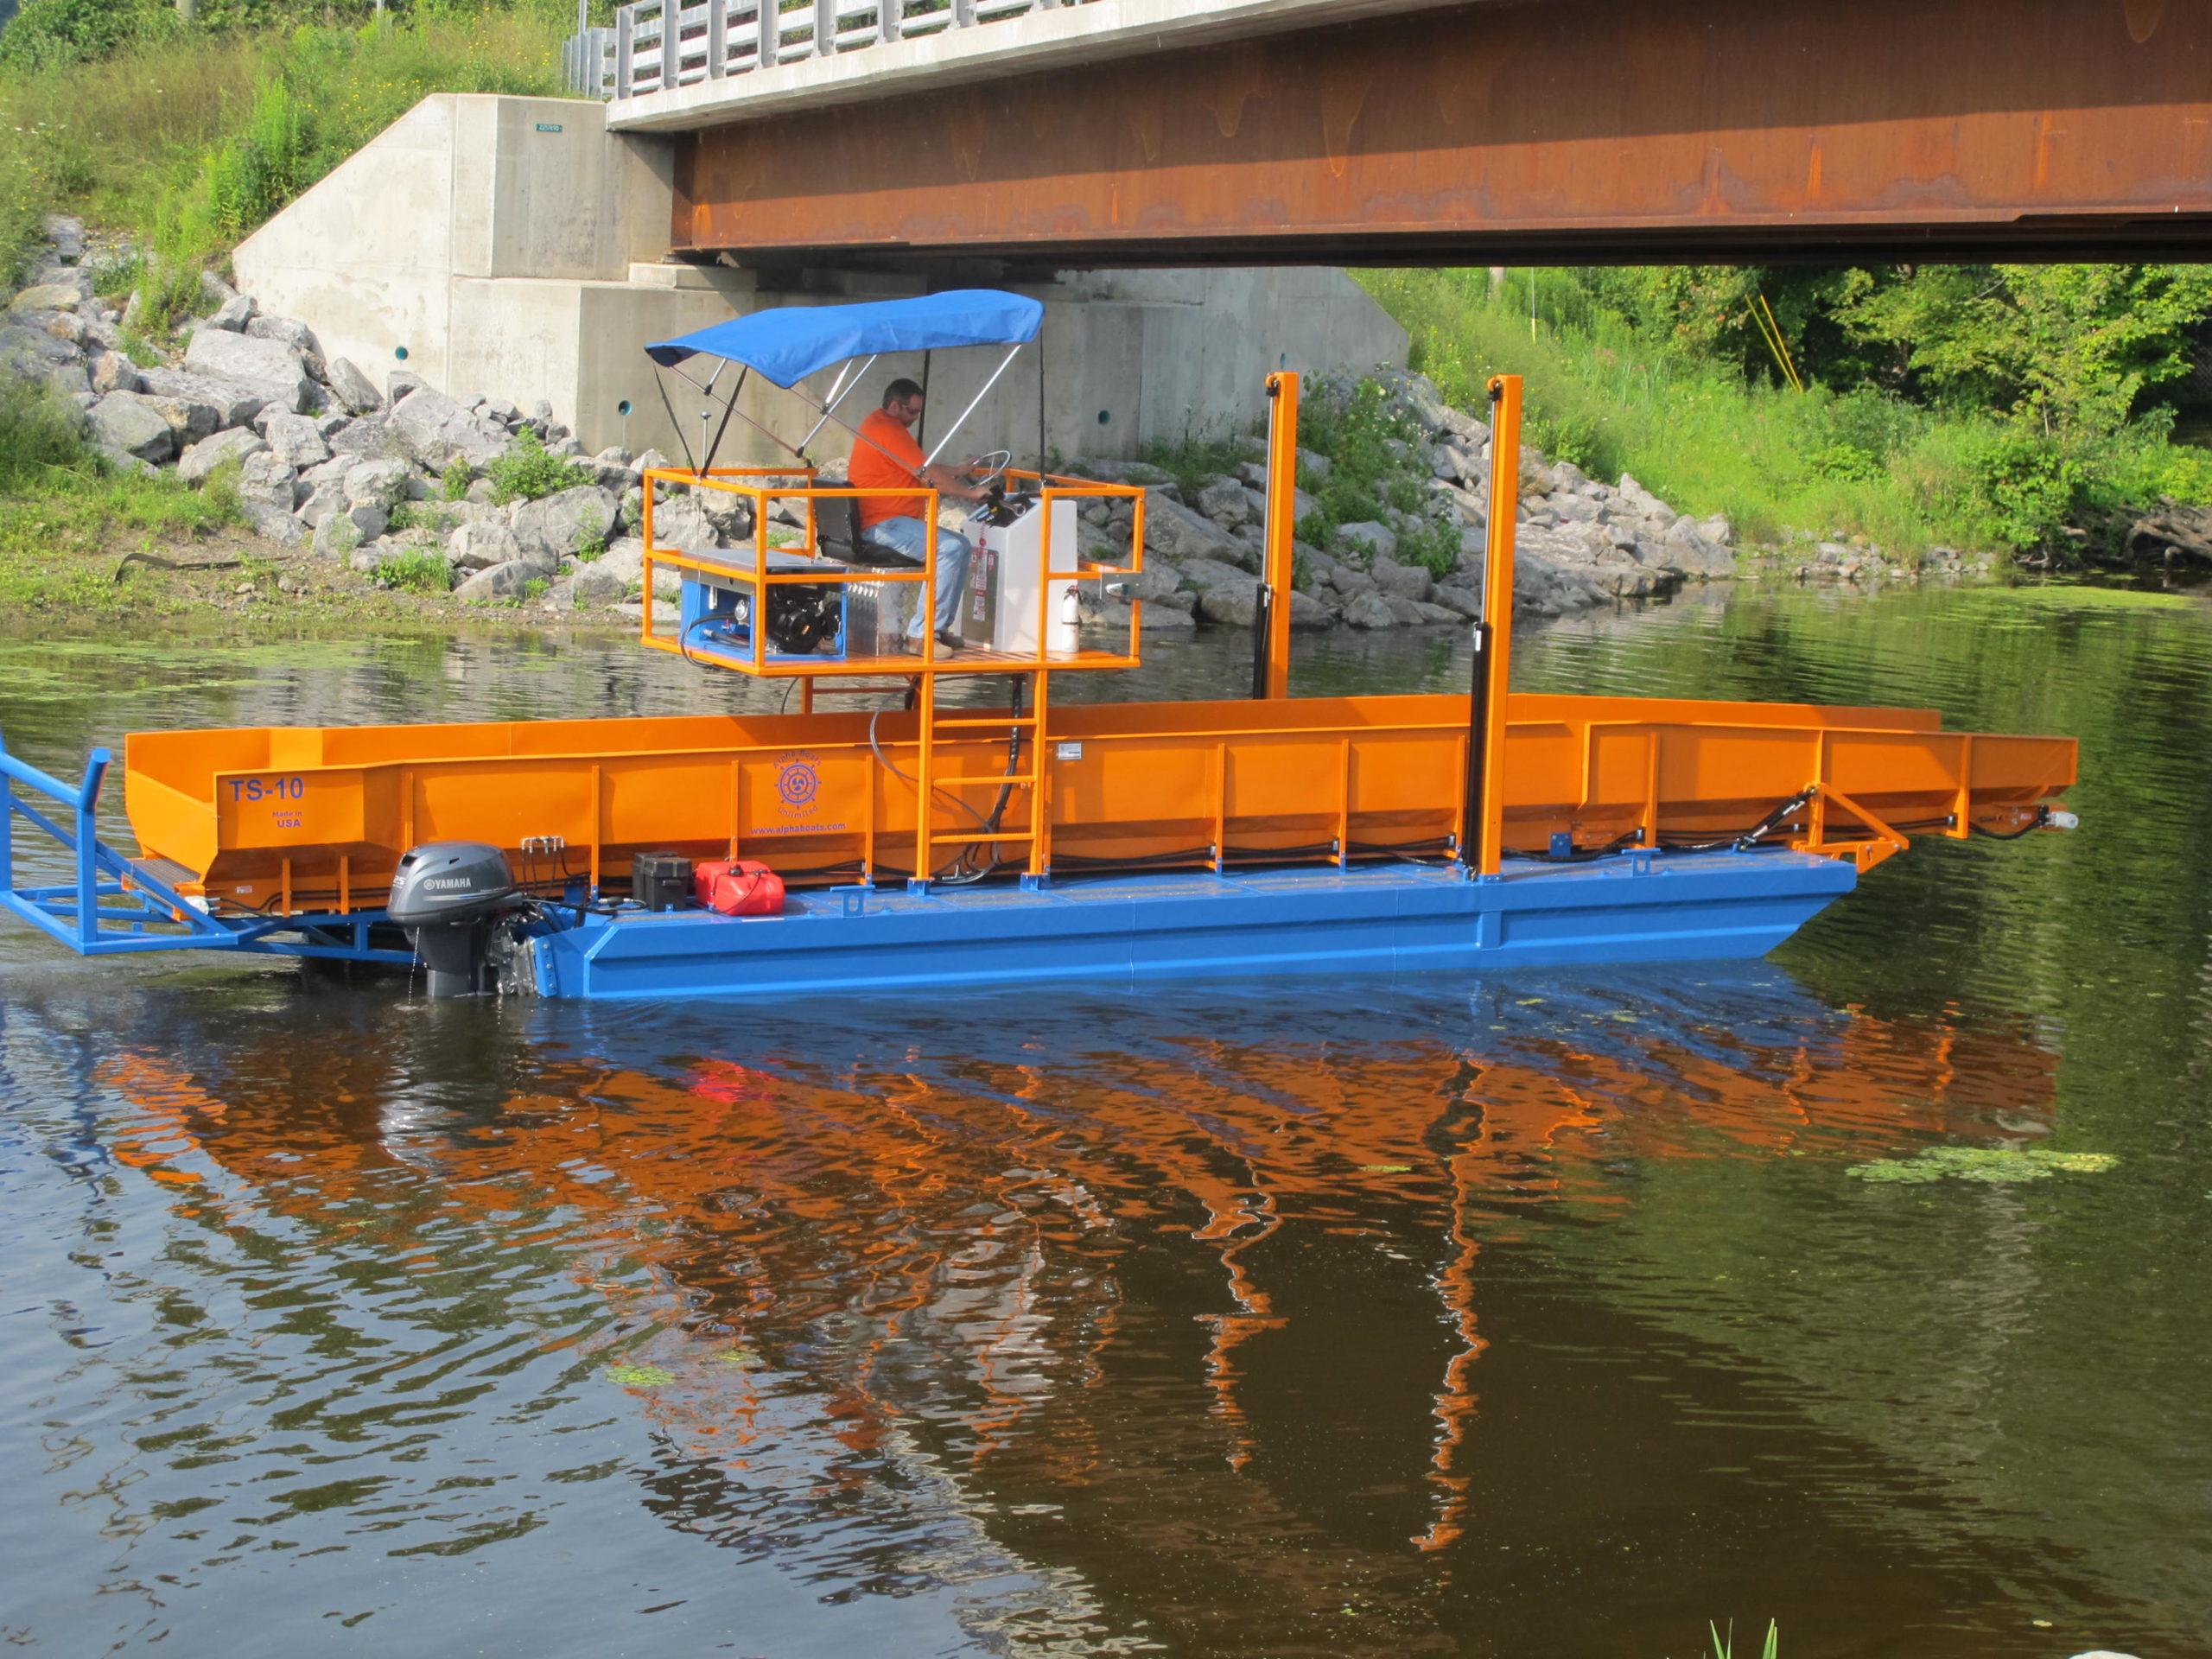 Alphaboats TS10 Transport Barge